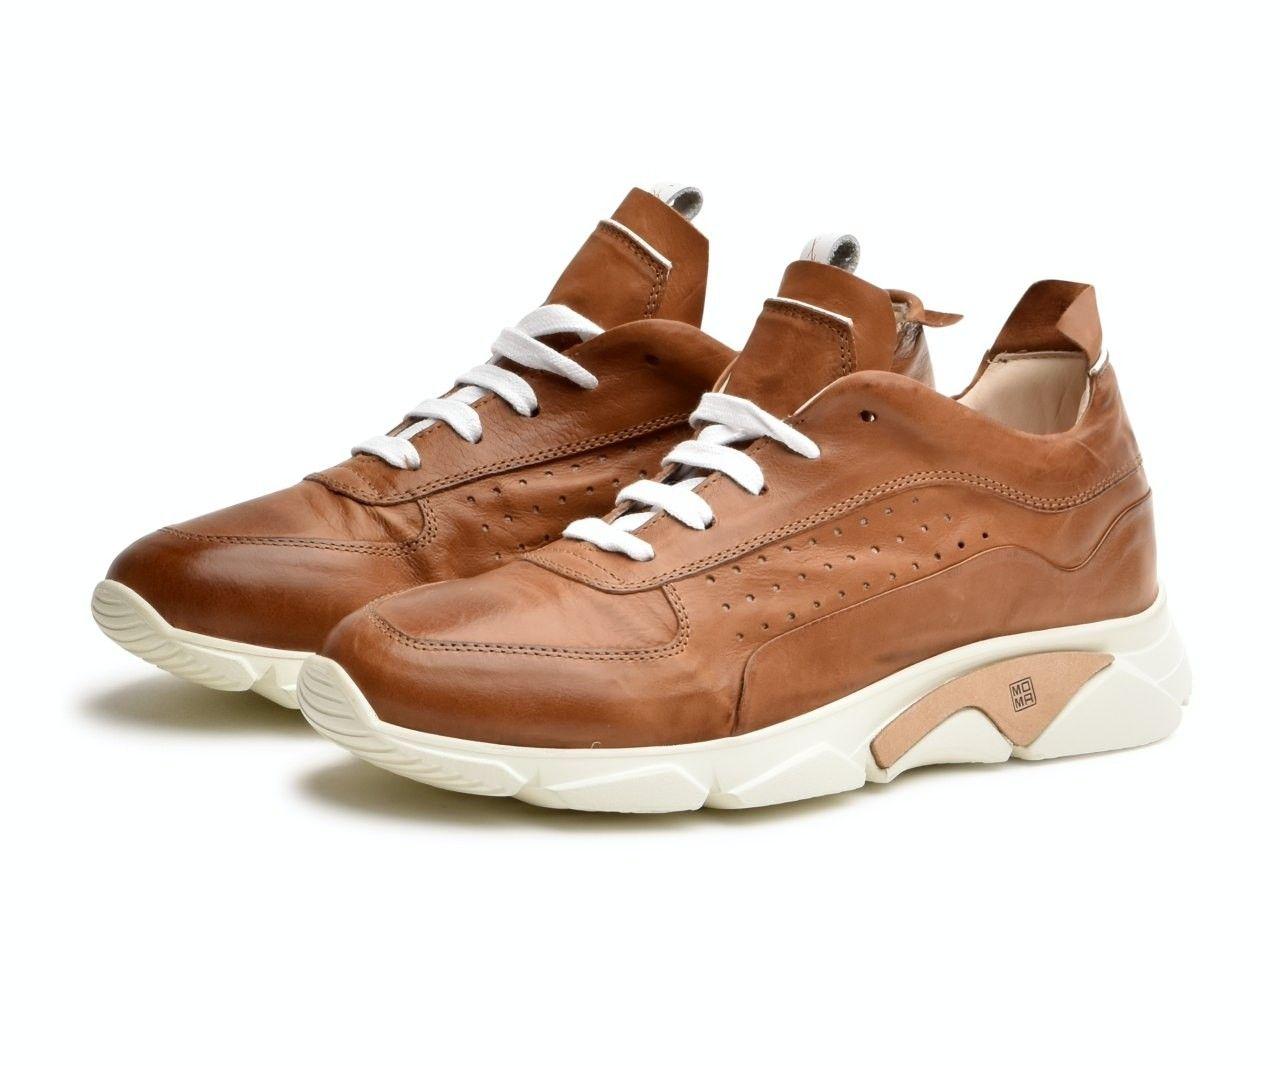 MOMA - Herren Sneaker - Allaciata Runner Sombrero - Cinnamon